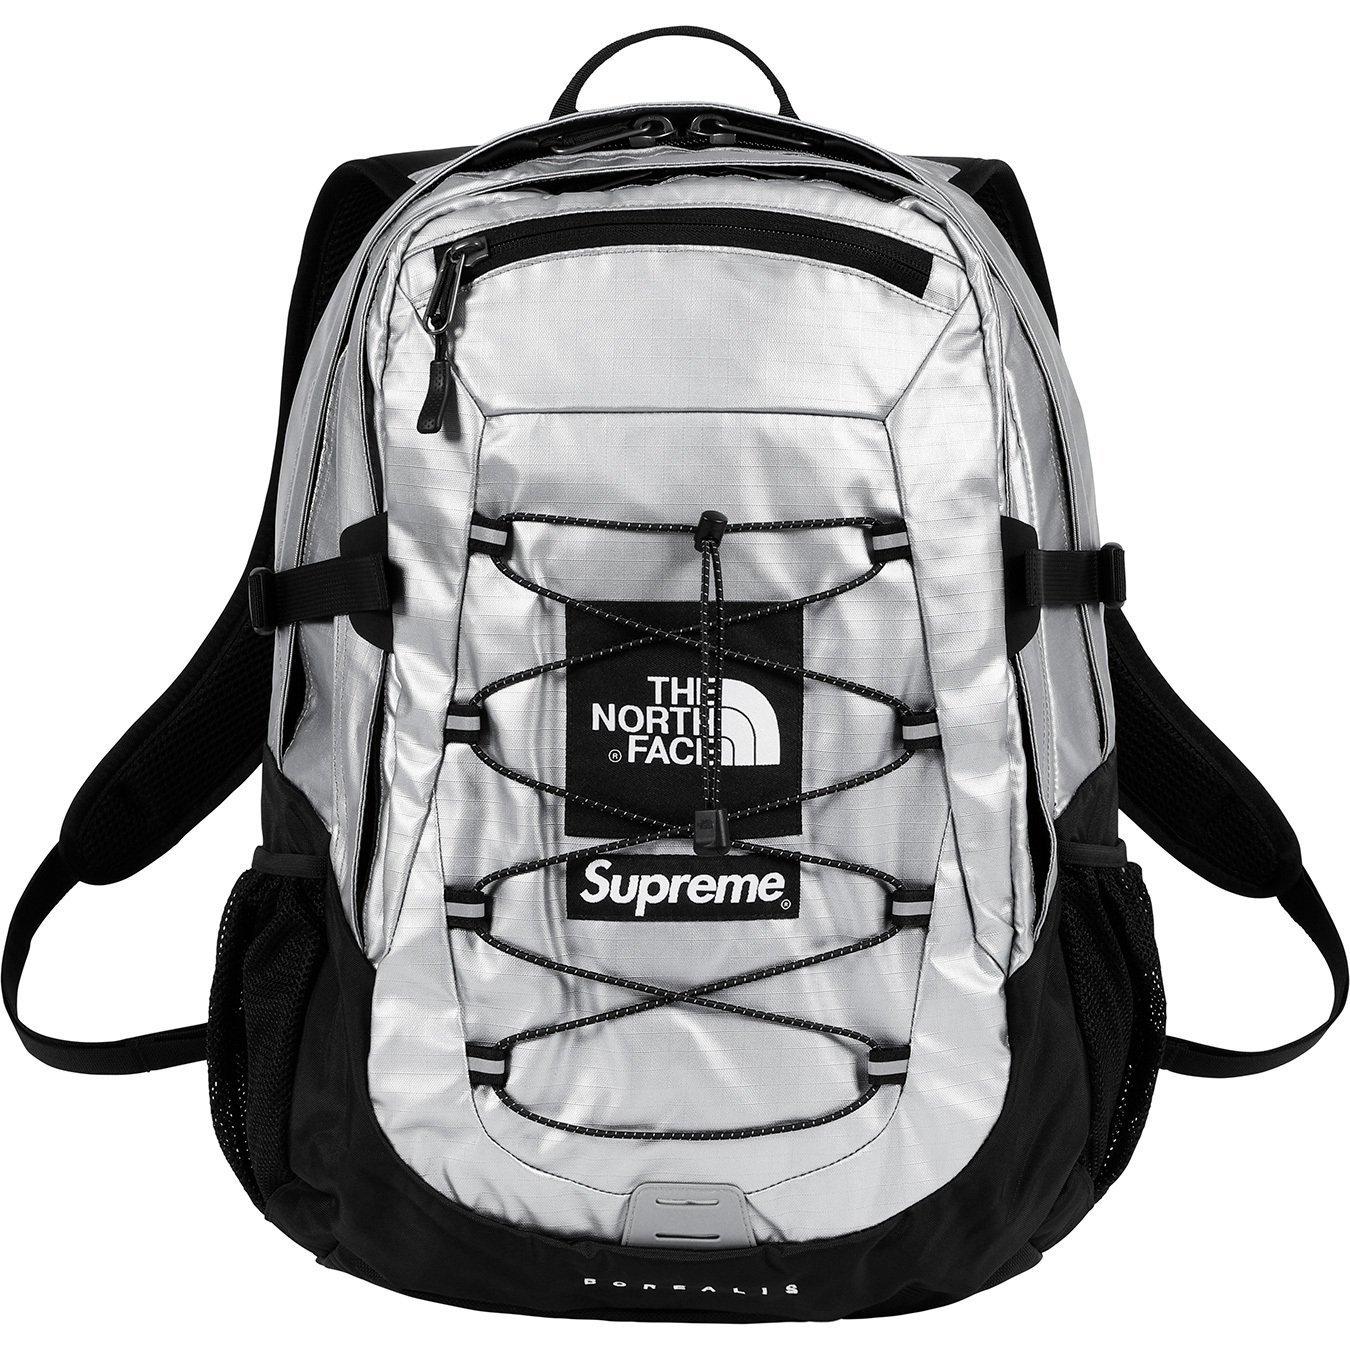 Supreme® / The North Face® Metallic Borealis BackpackSilver18SS ( シュプリーム / ノースフェイス メタリック ボレアリス バックパック シルバー 18SS)[国内正規品] B07C13F3SKSilver